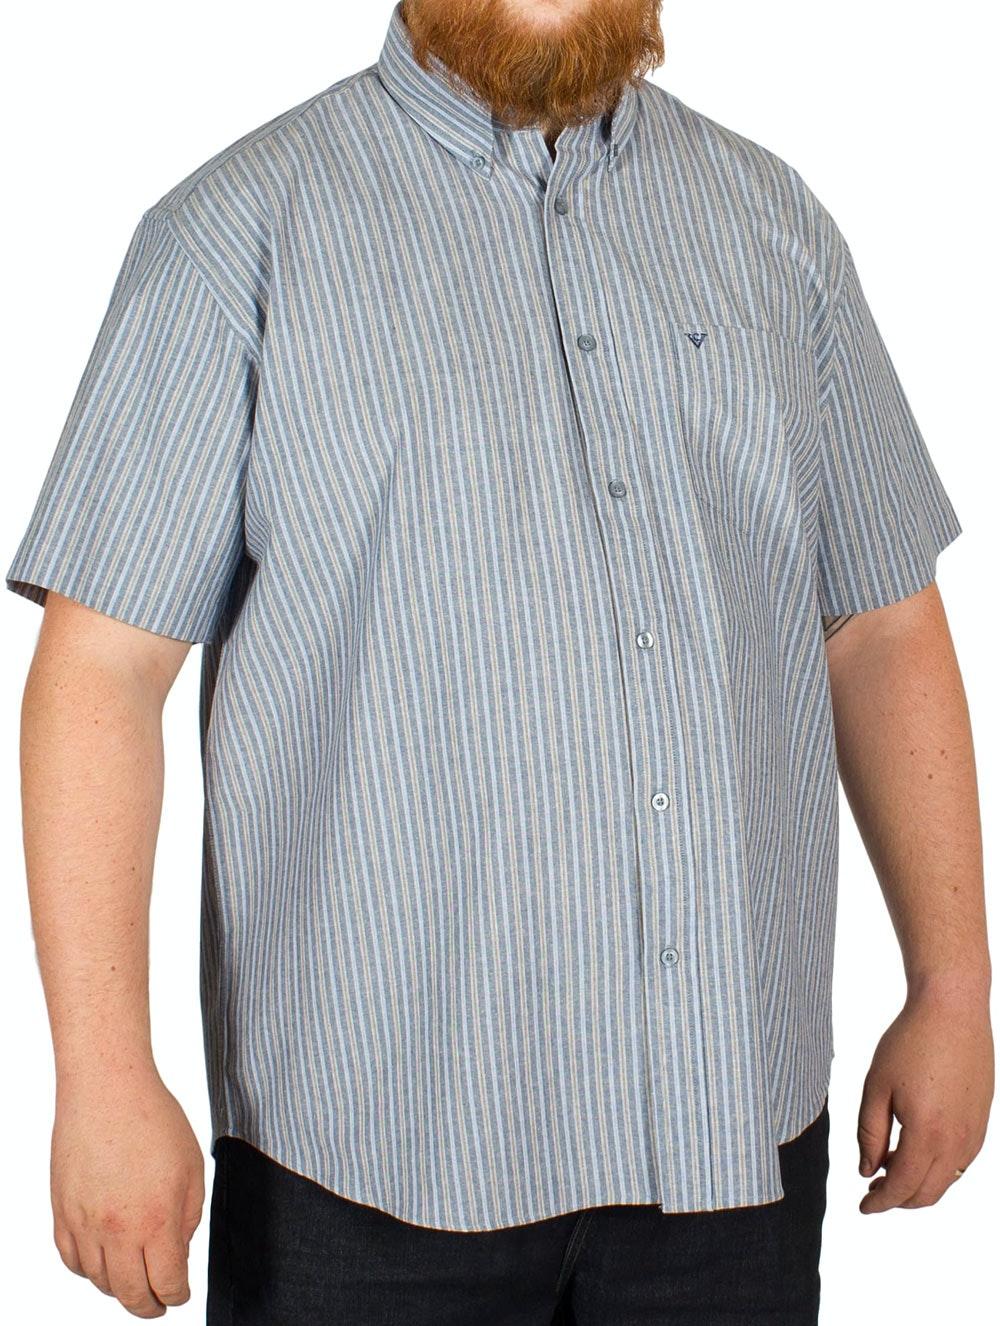 Cotton Valley Striped Oxford Shirt Blue